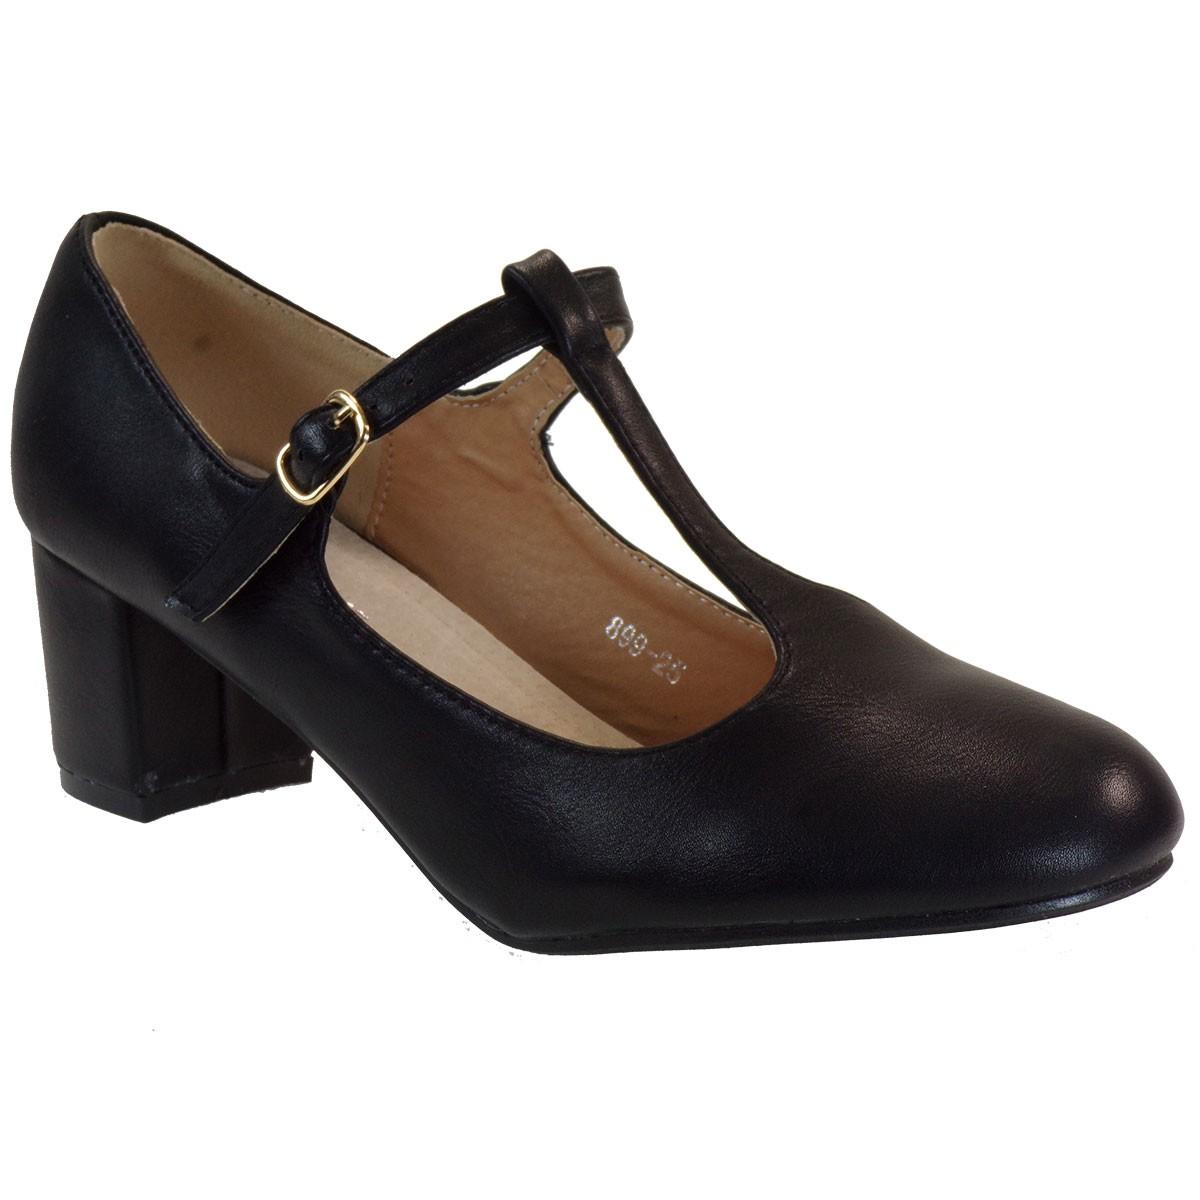 Bagiotashoes Γυναικεία Παπούτσια Β99-25 Mαύρο